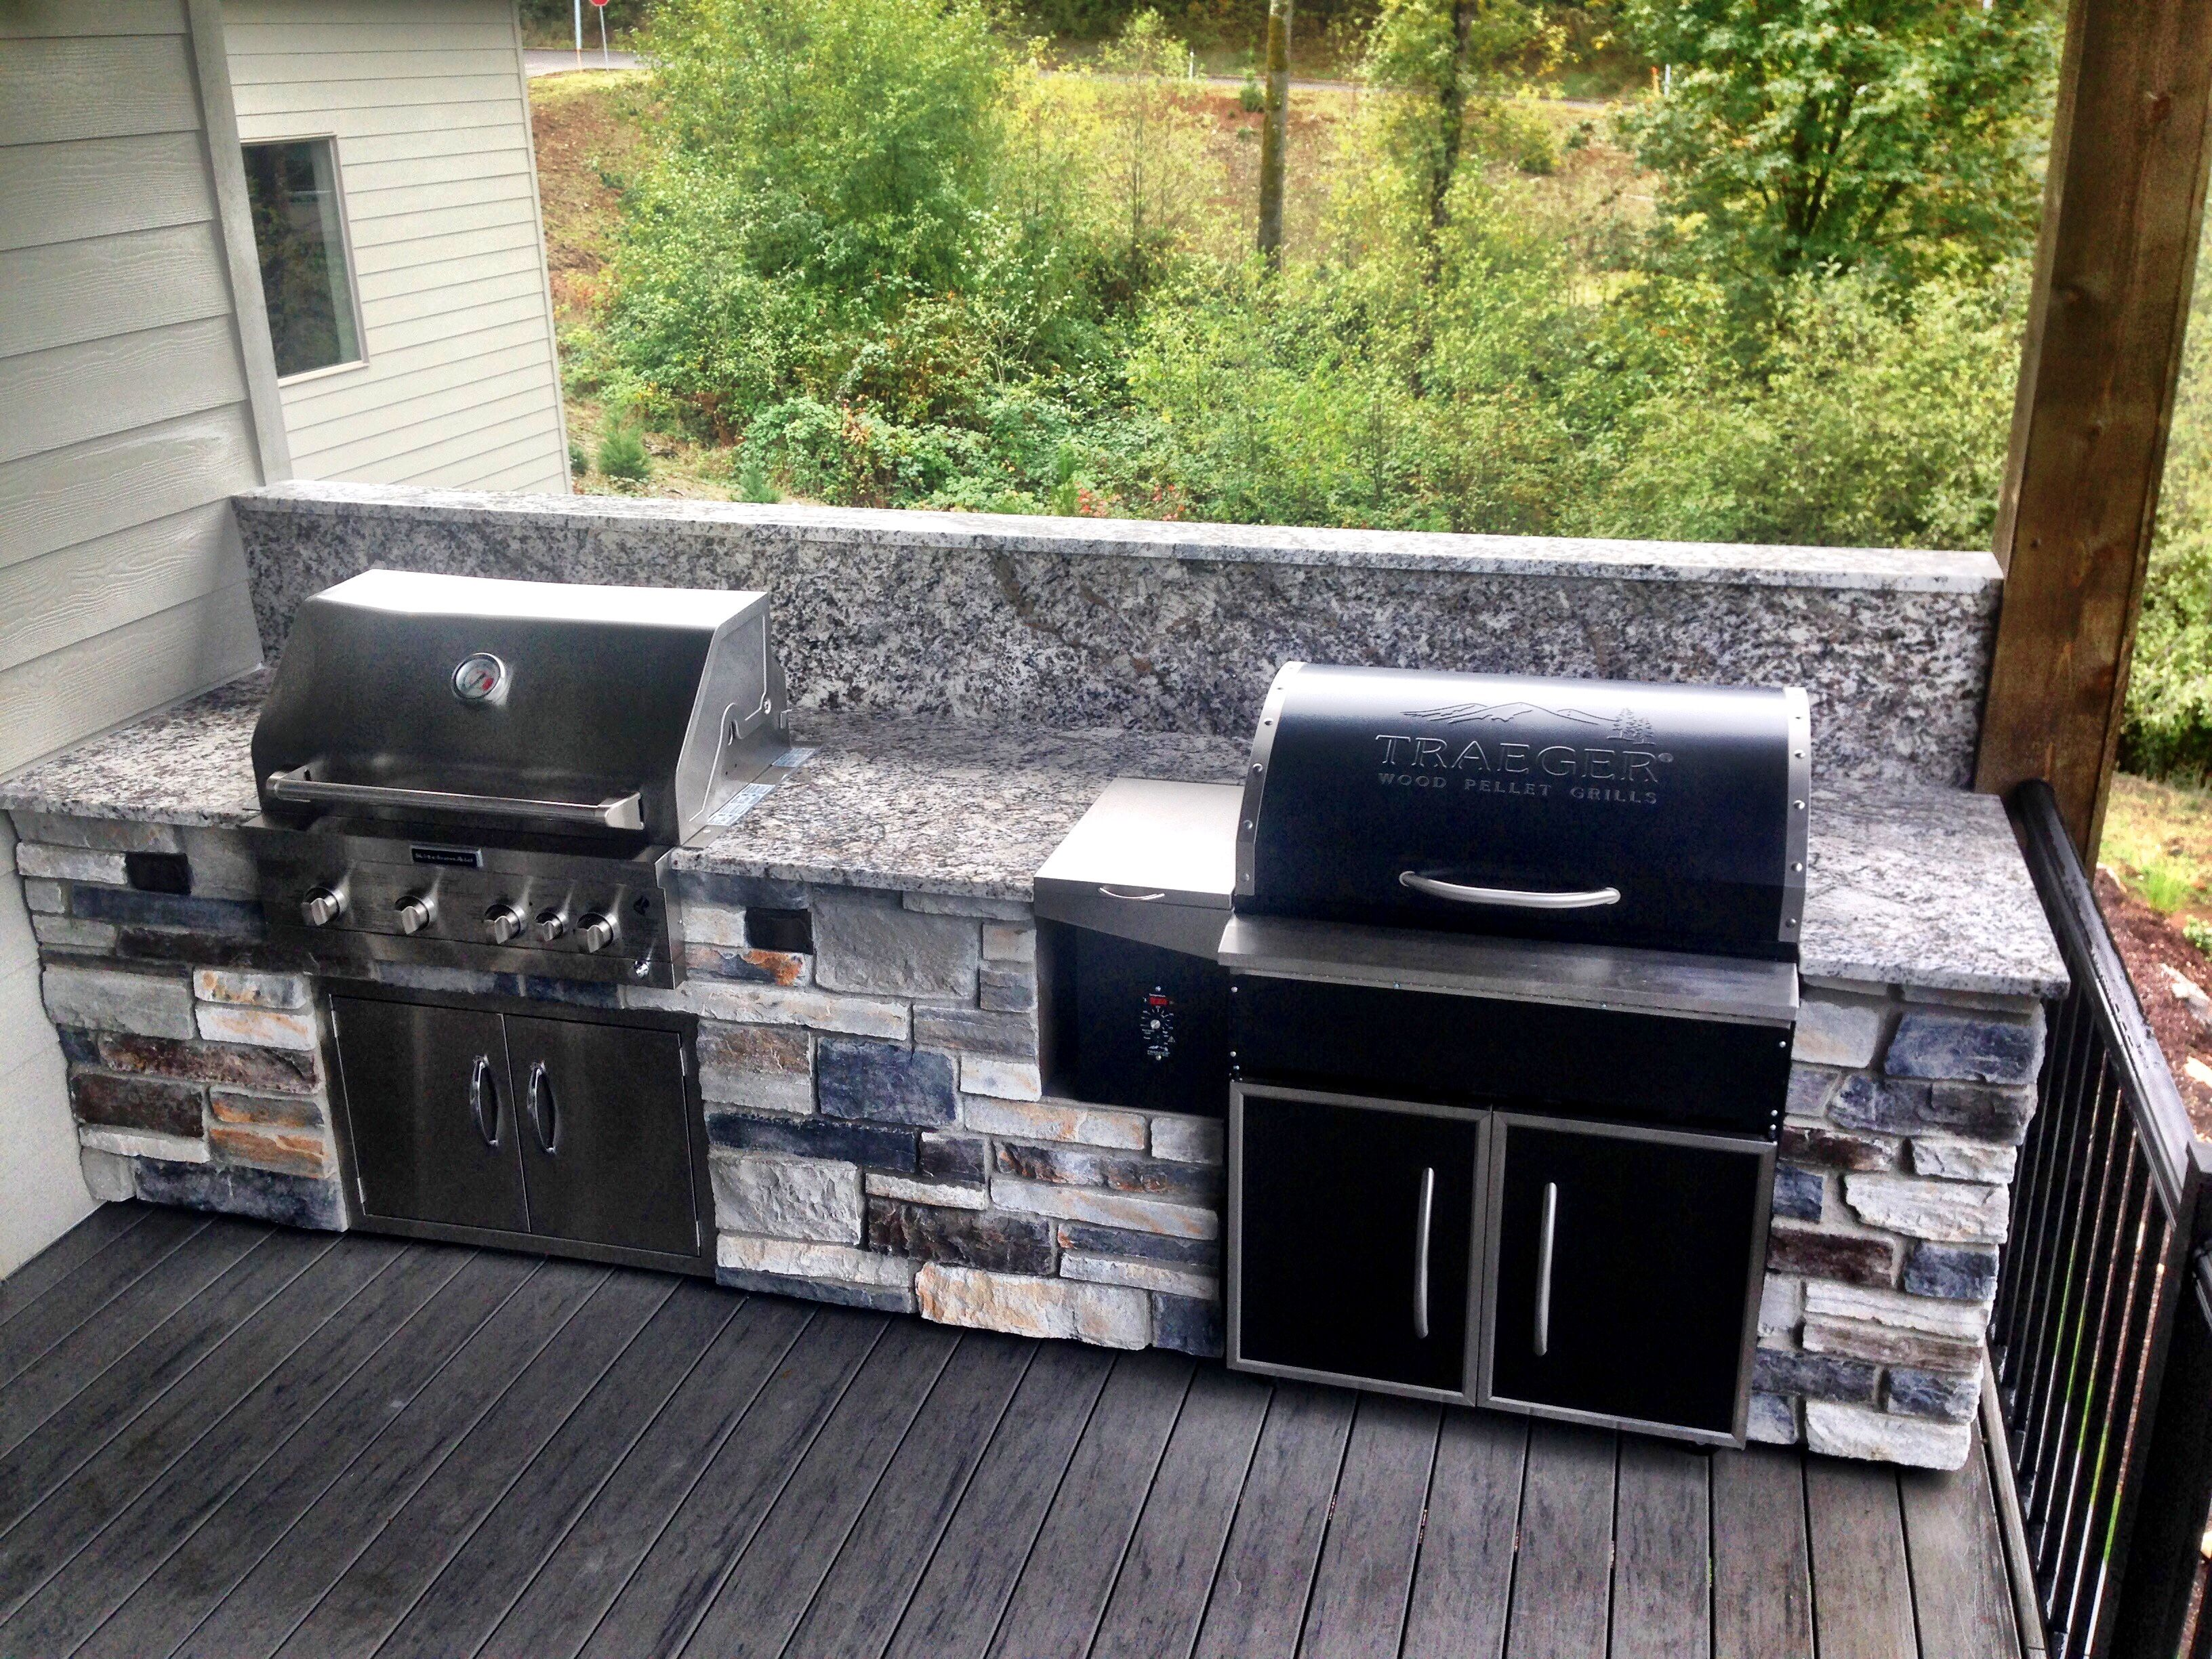 Outdoor kitchen in salem oregon october 2016 traeger for Outdoor kitchen grill insert